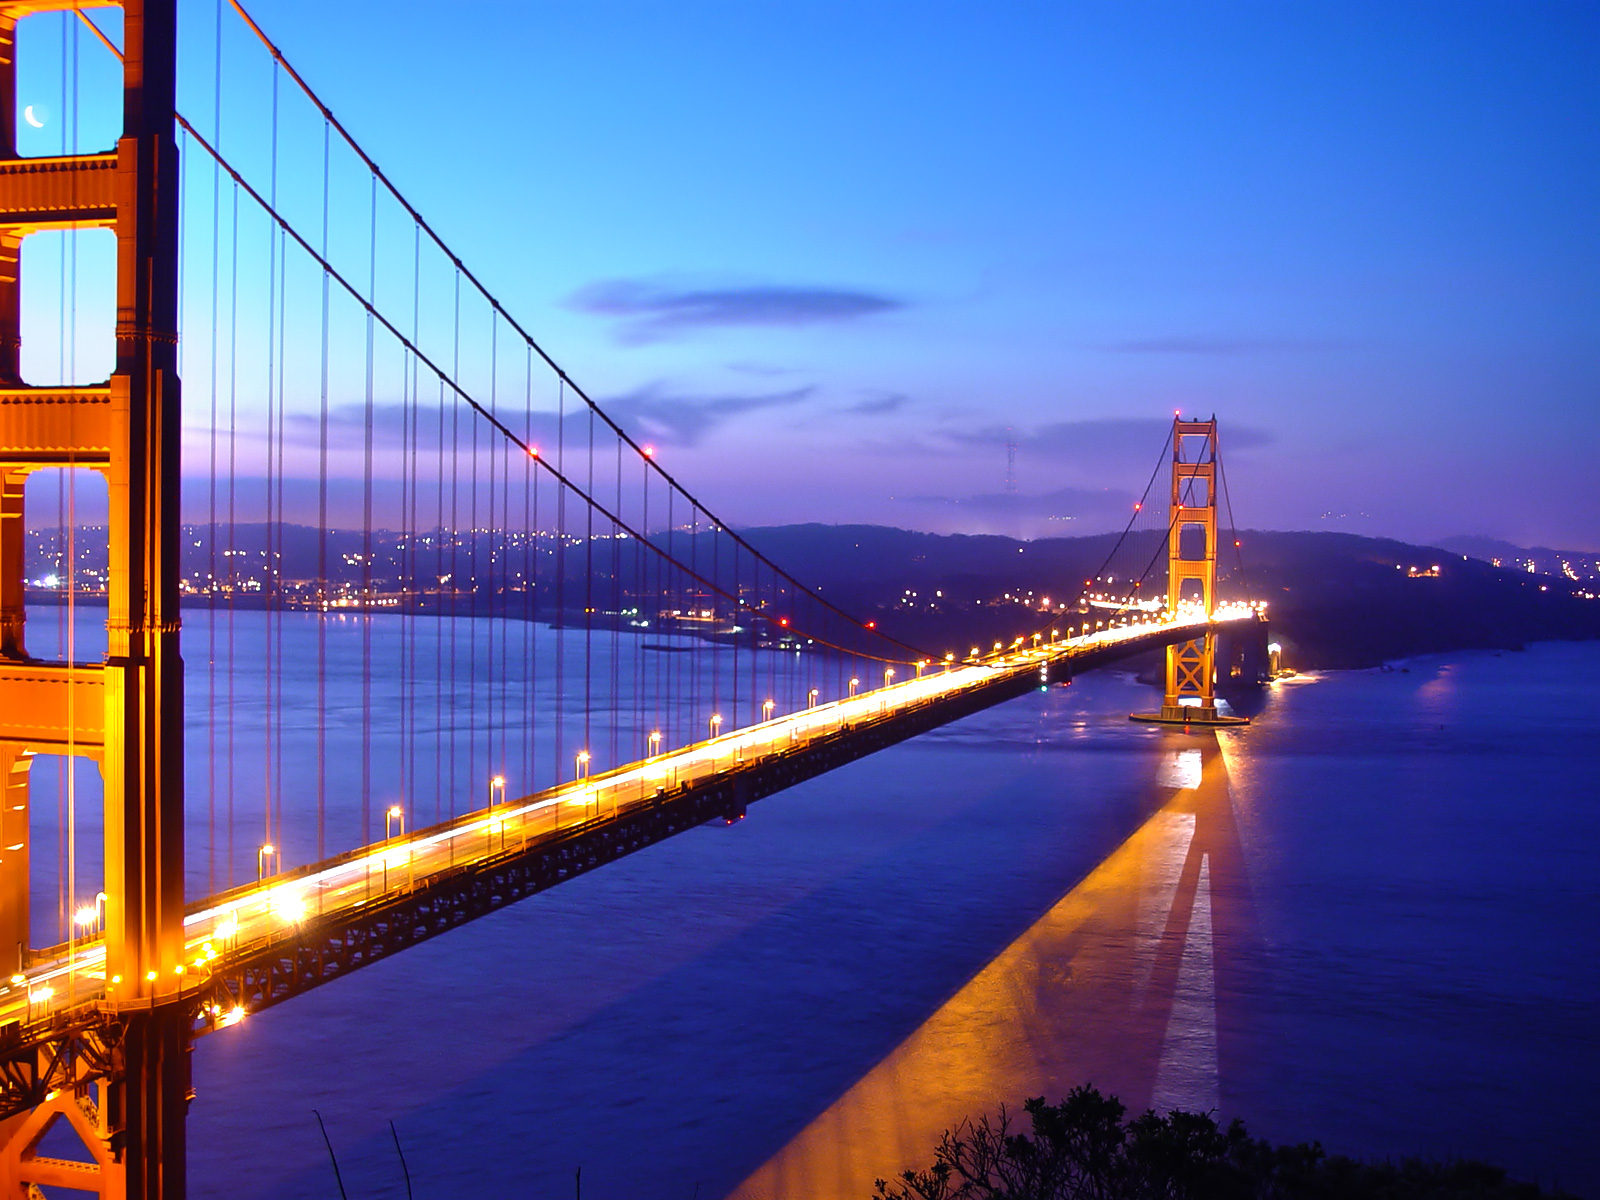 Must see Wallpaper Night Golden Gate Bridge - golden-gate-bridge  Best Photo Reference-42887.jpg